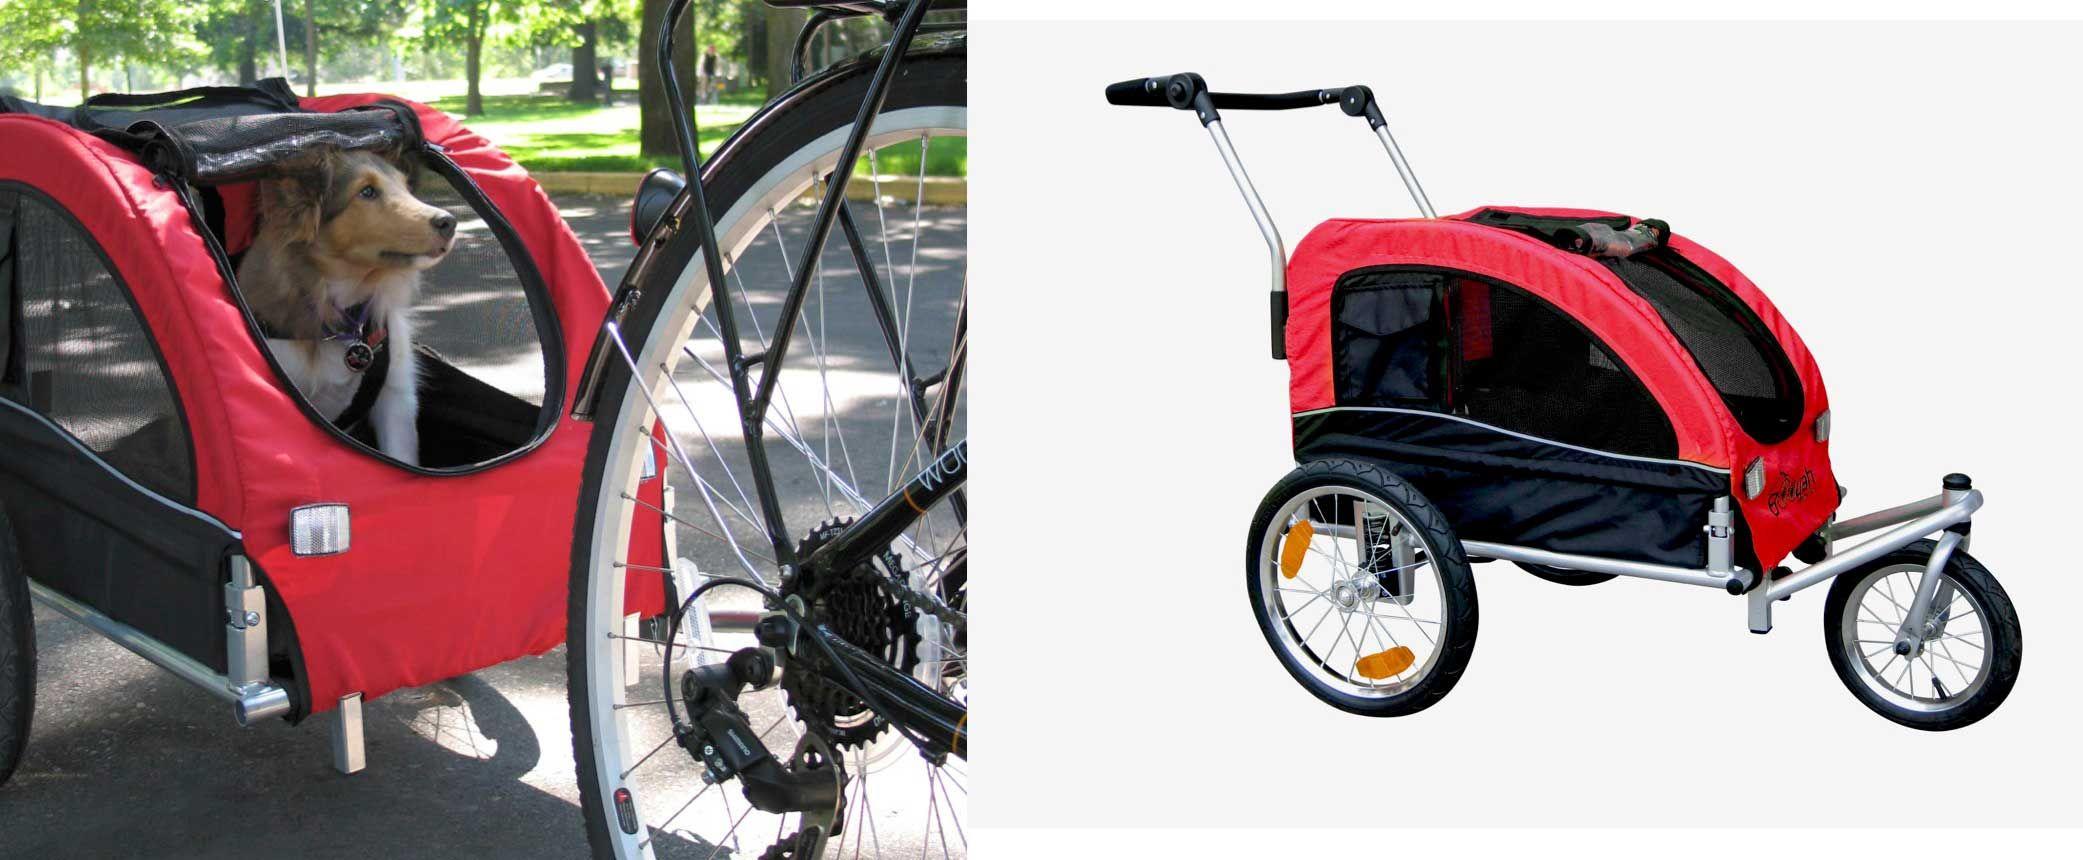 Medium Pet Stroller Pet stroller, Stroller, Pets